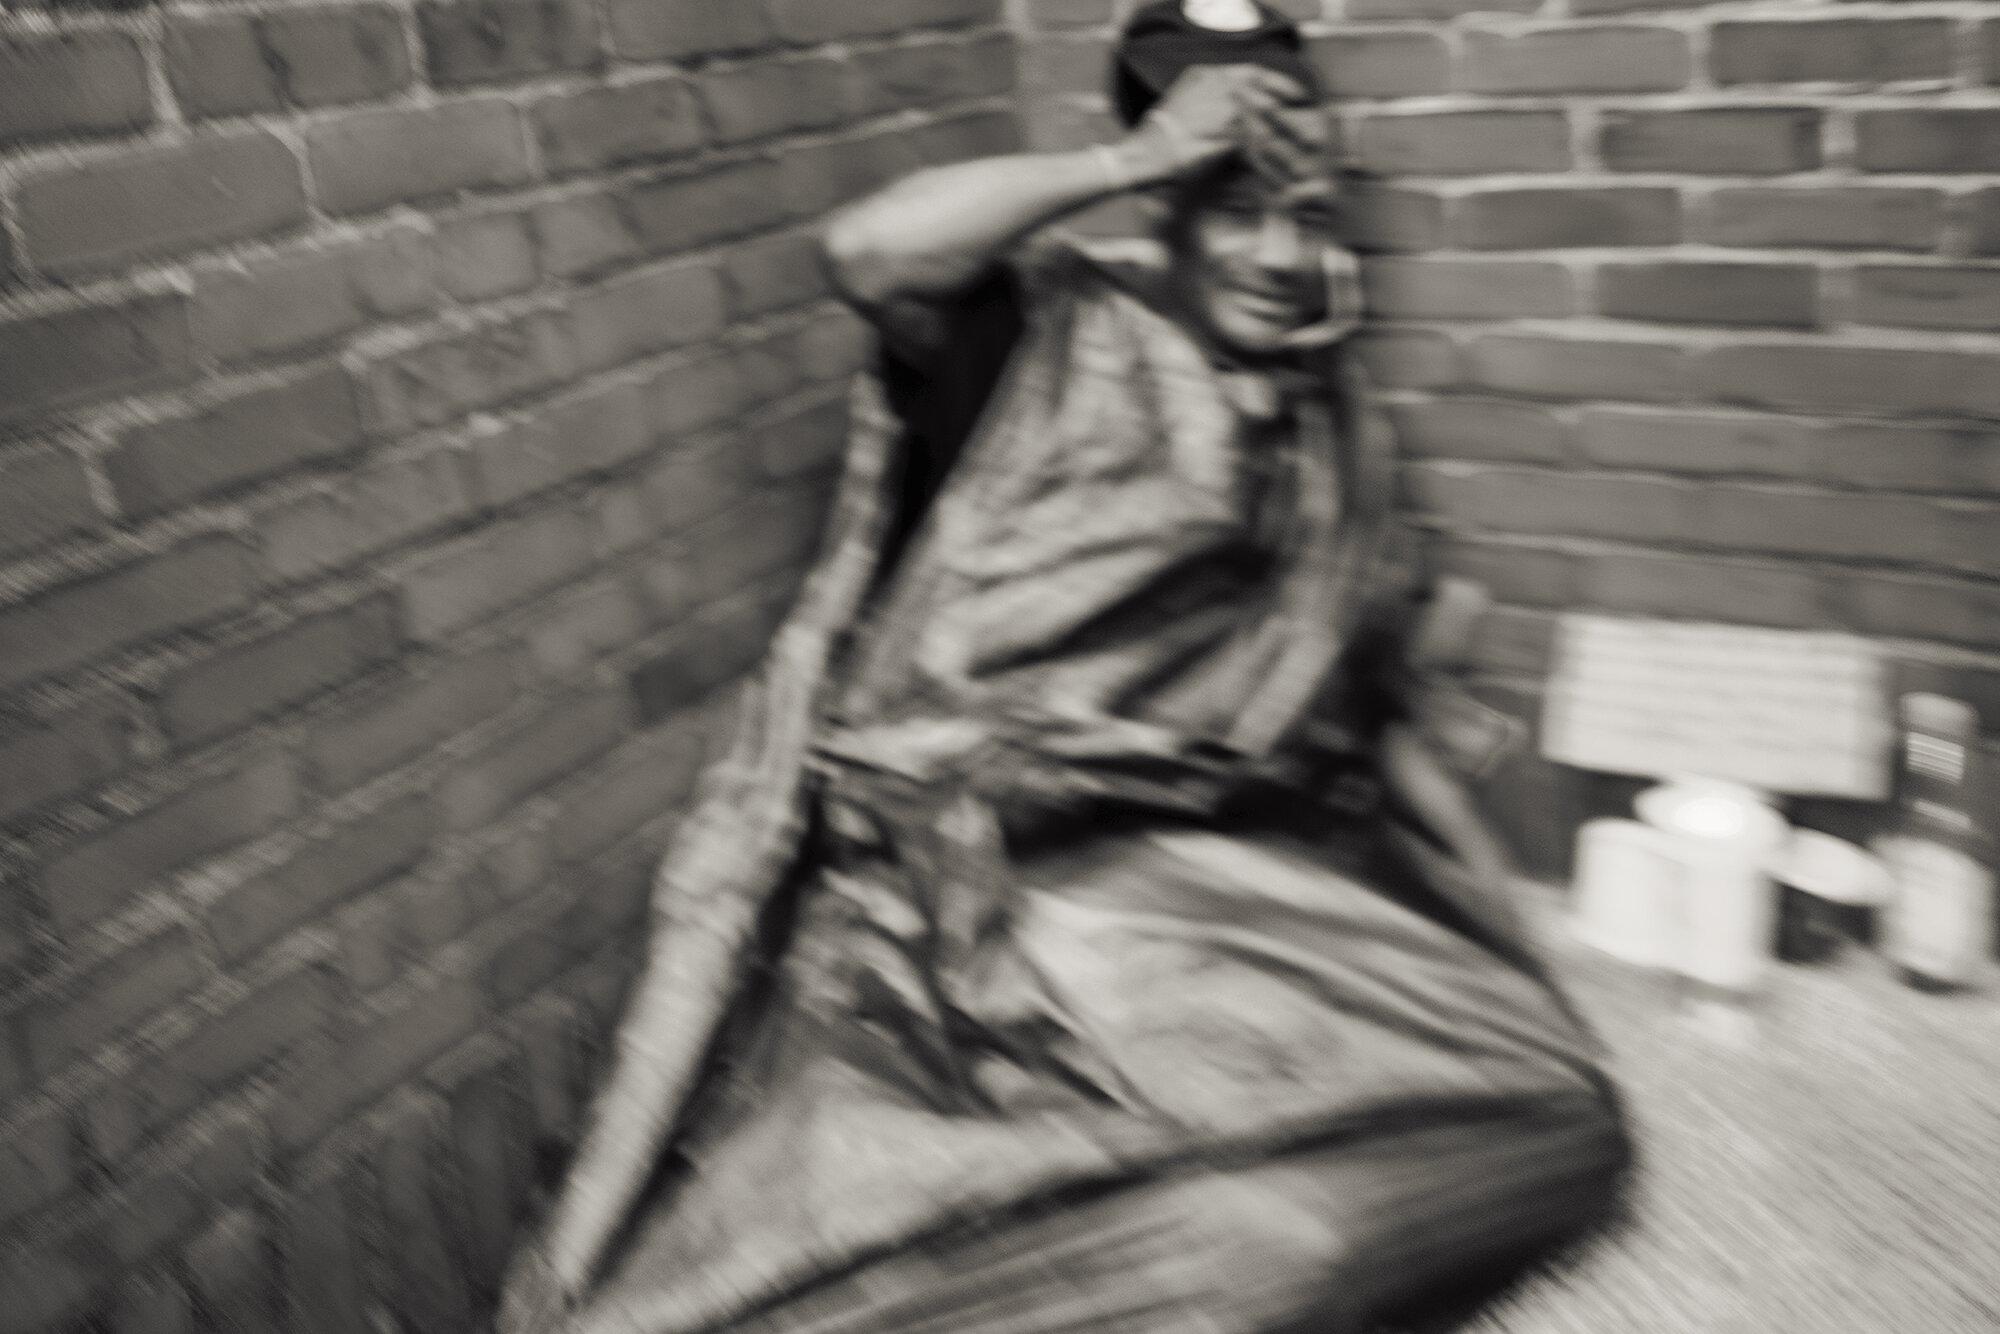 NYC_Street_2019_Homeless_Plastic_Bag_Man-003.jpg